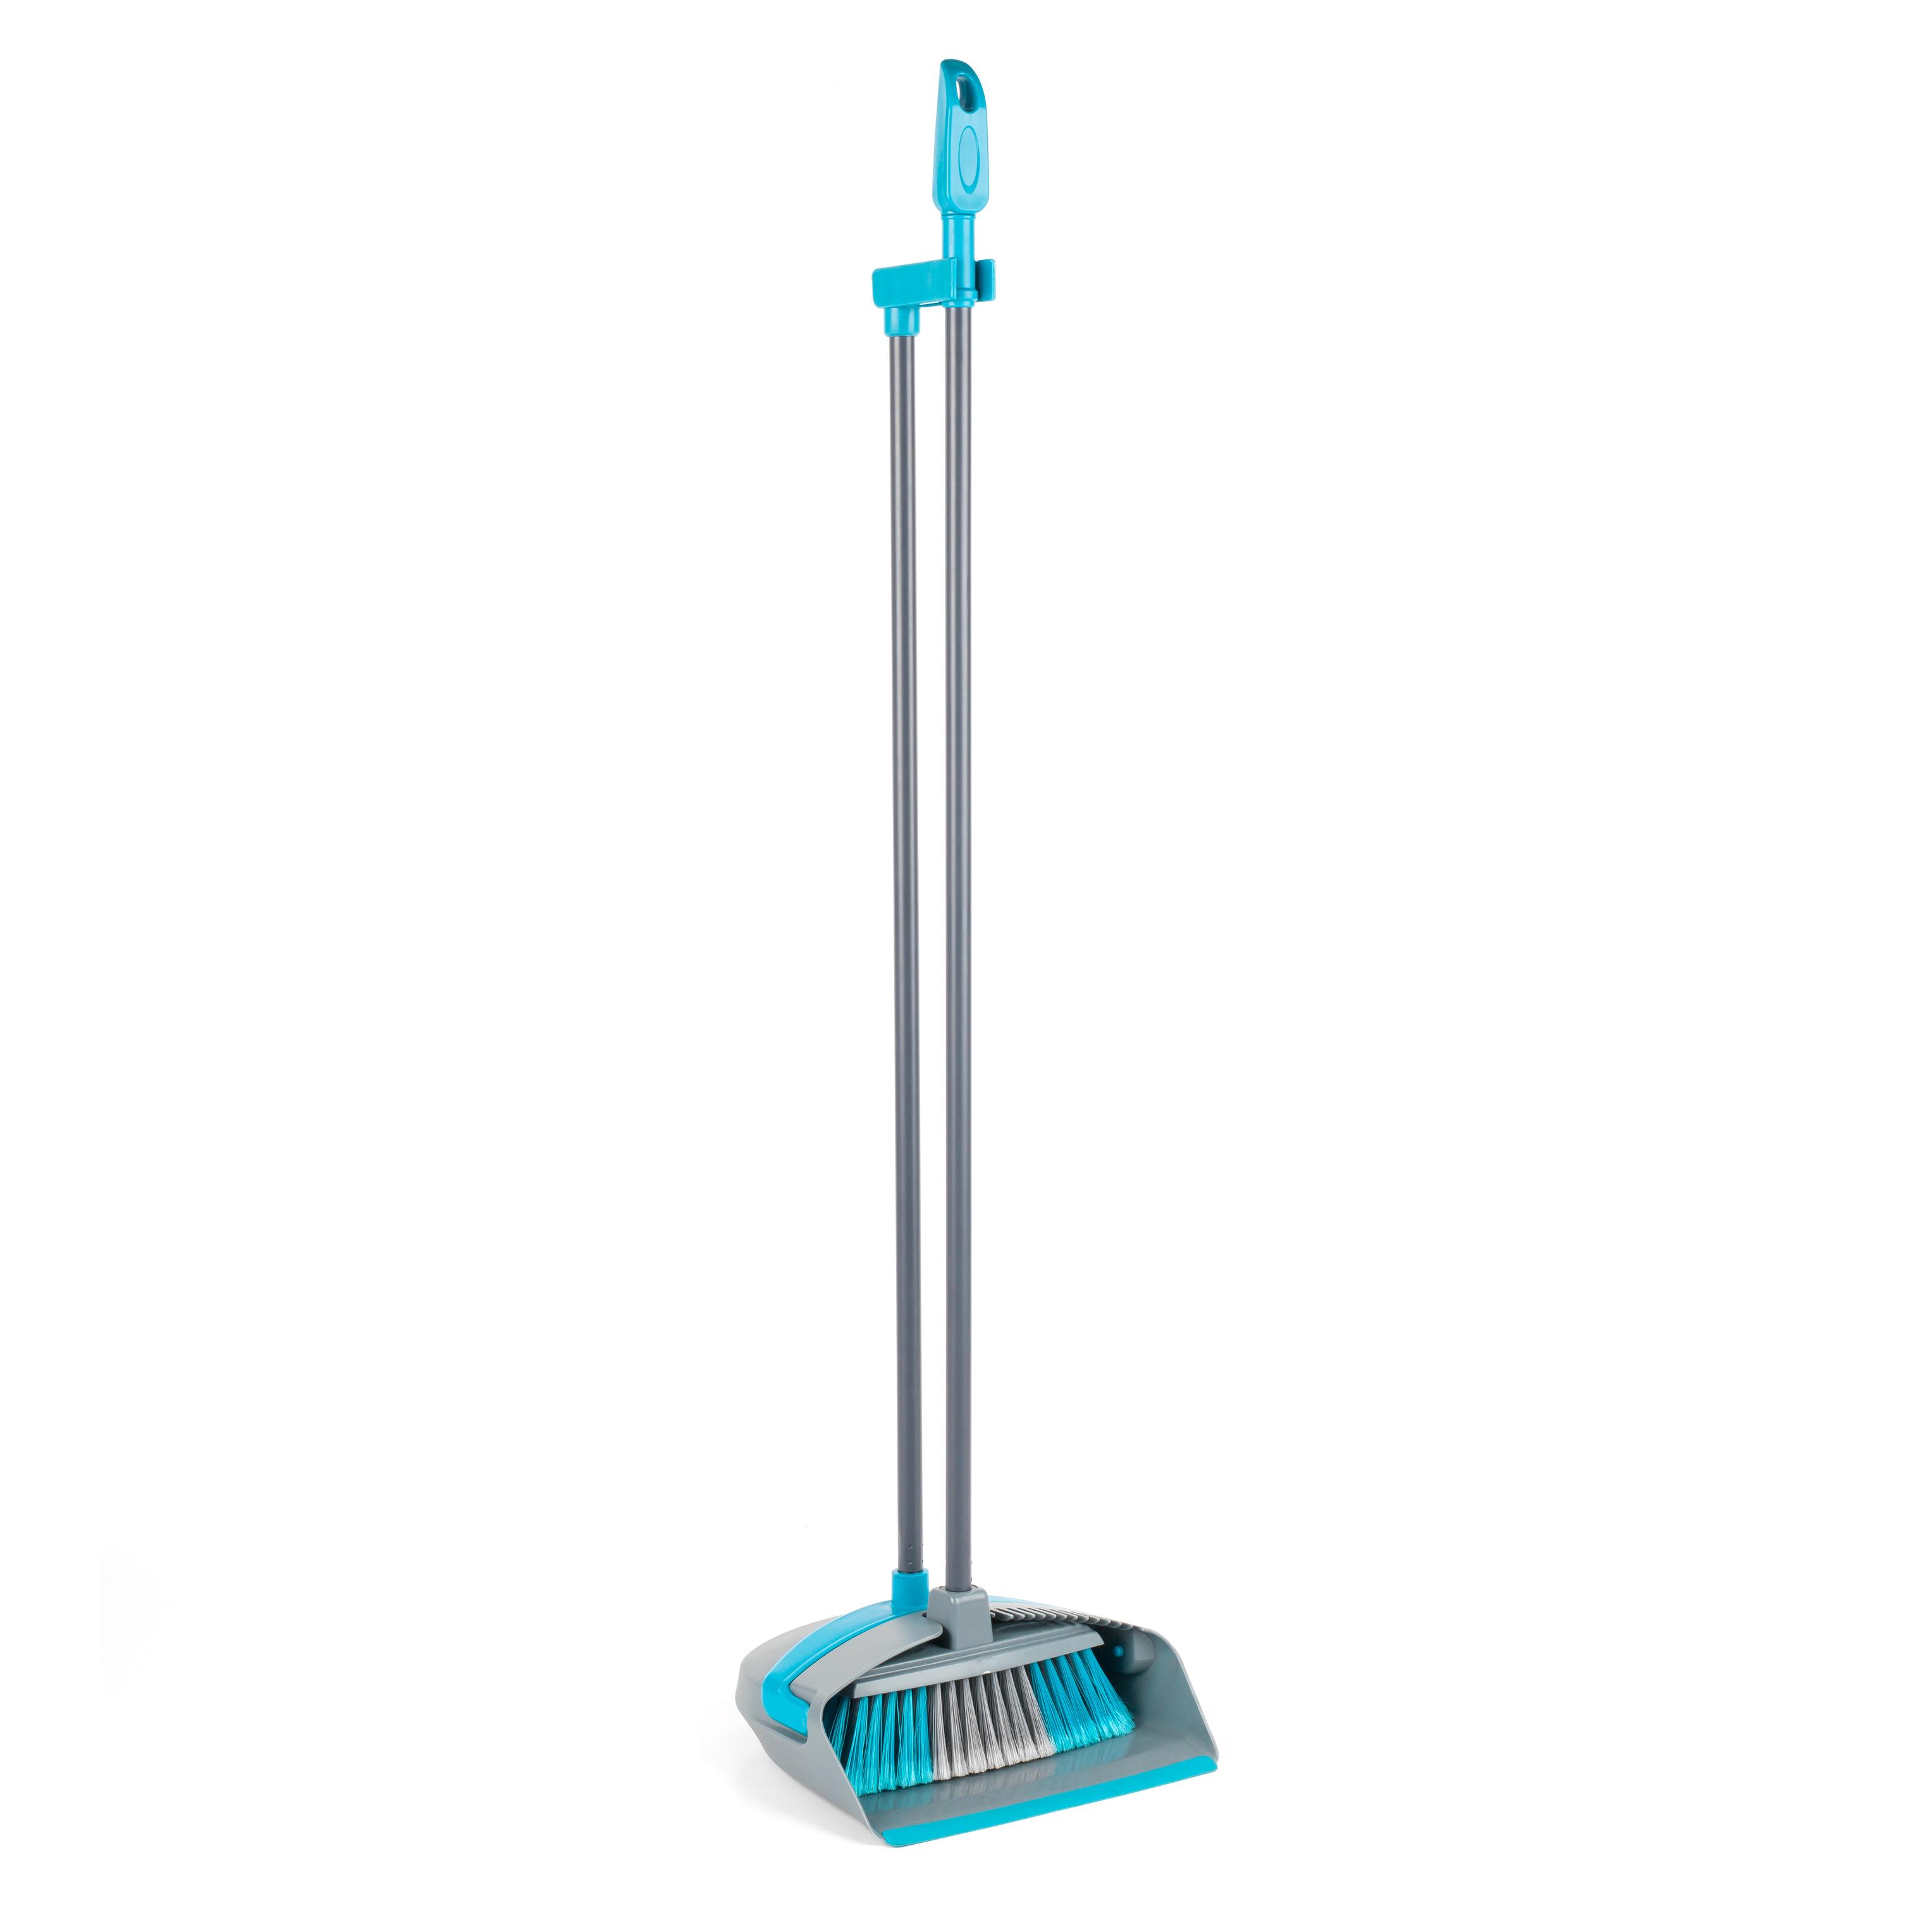 Beldray Beldray Long Handled Dustpan And Broom Beldray